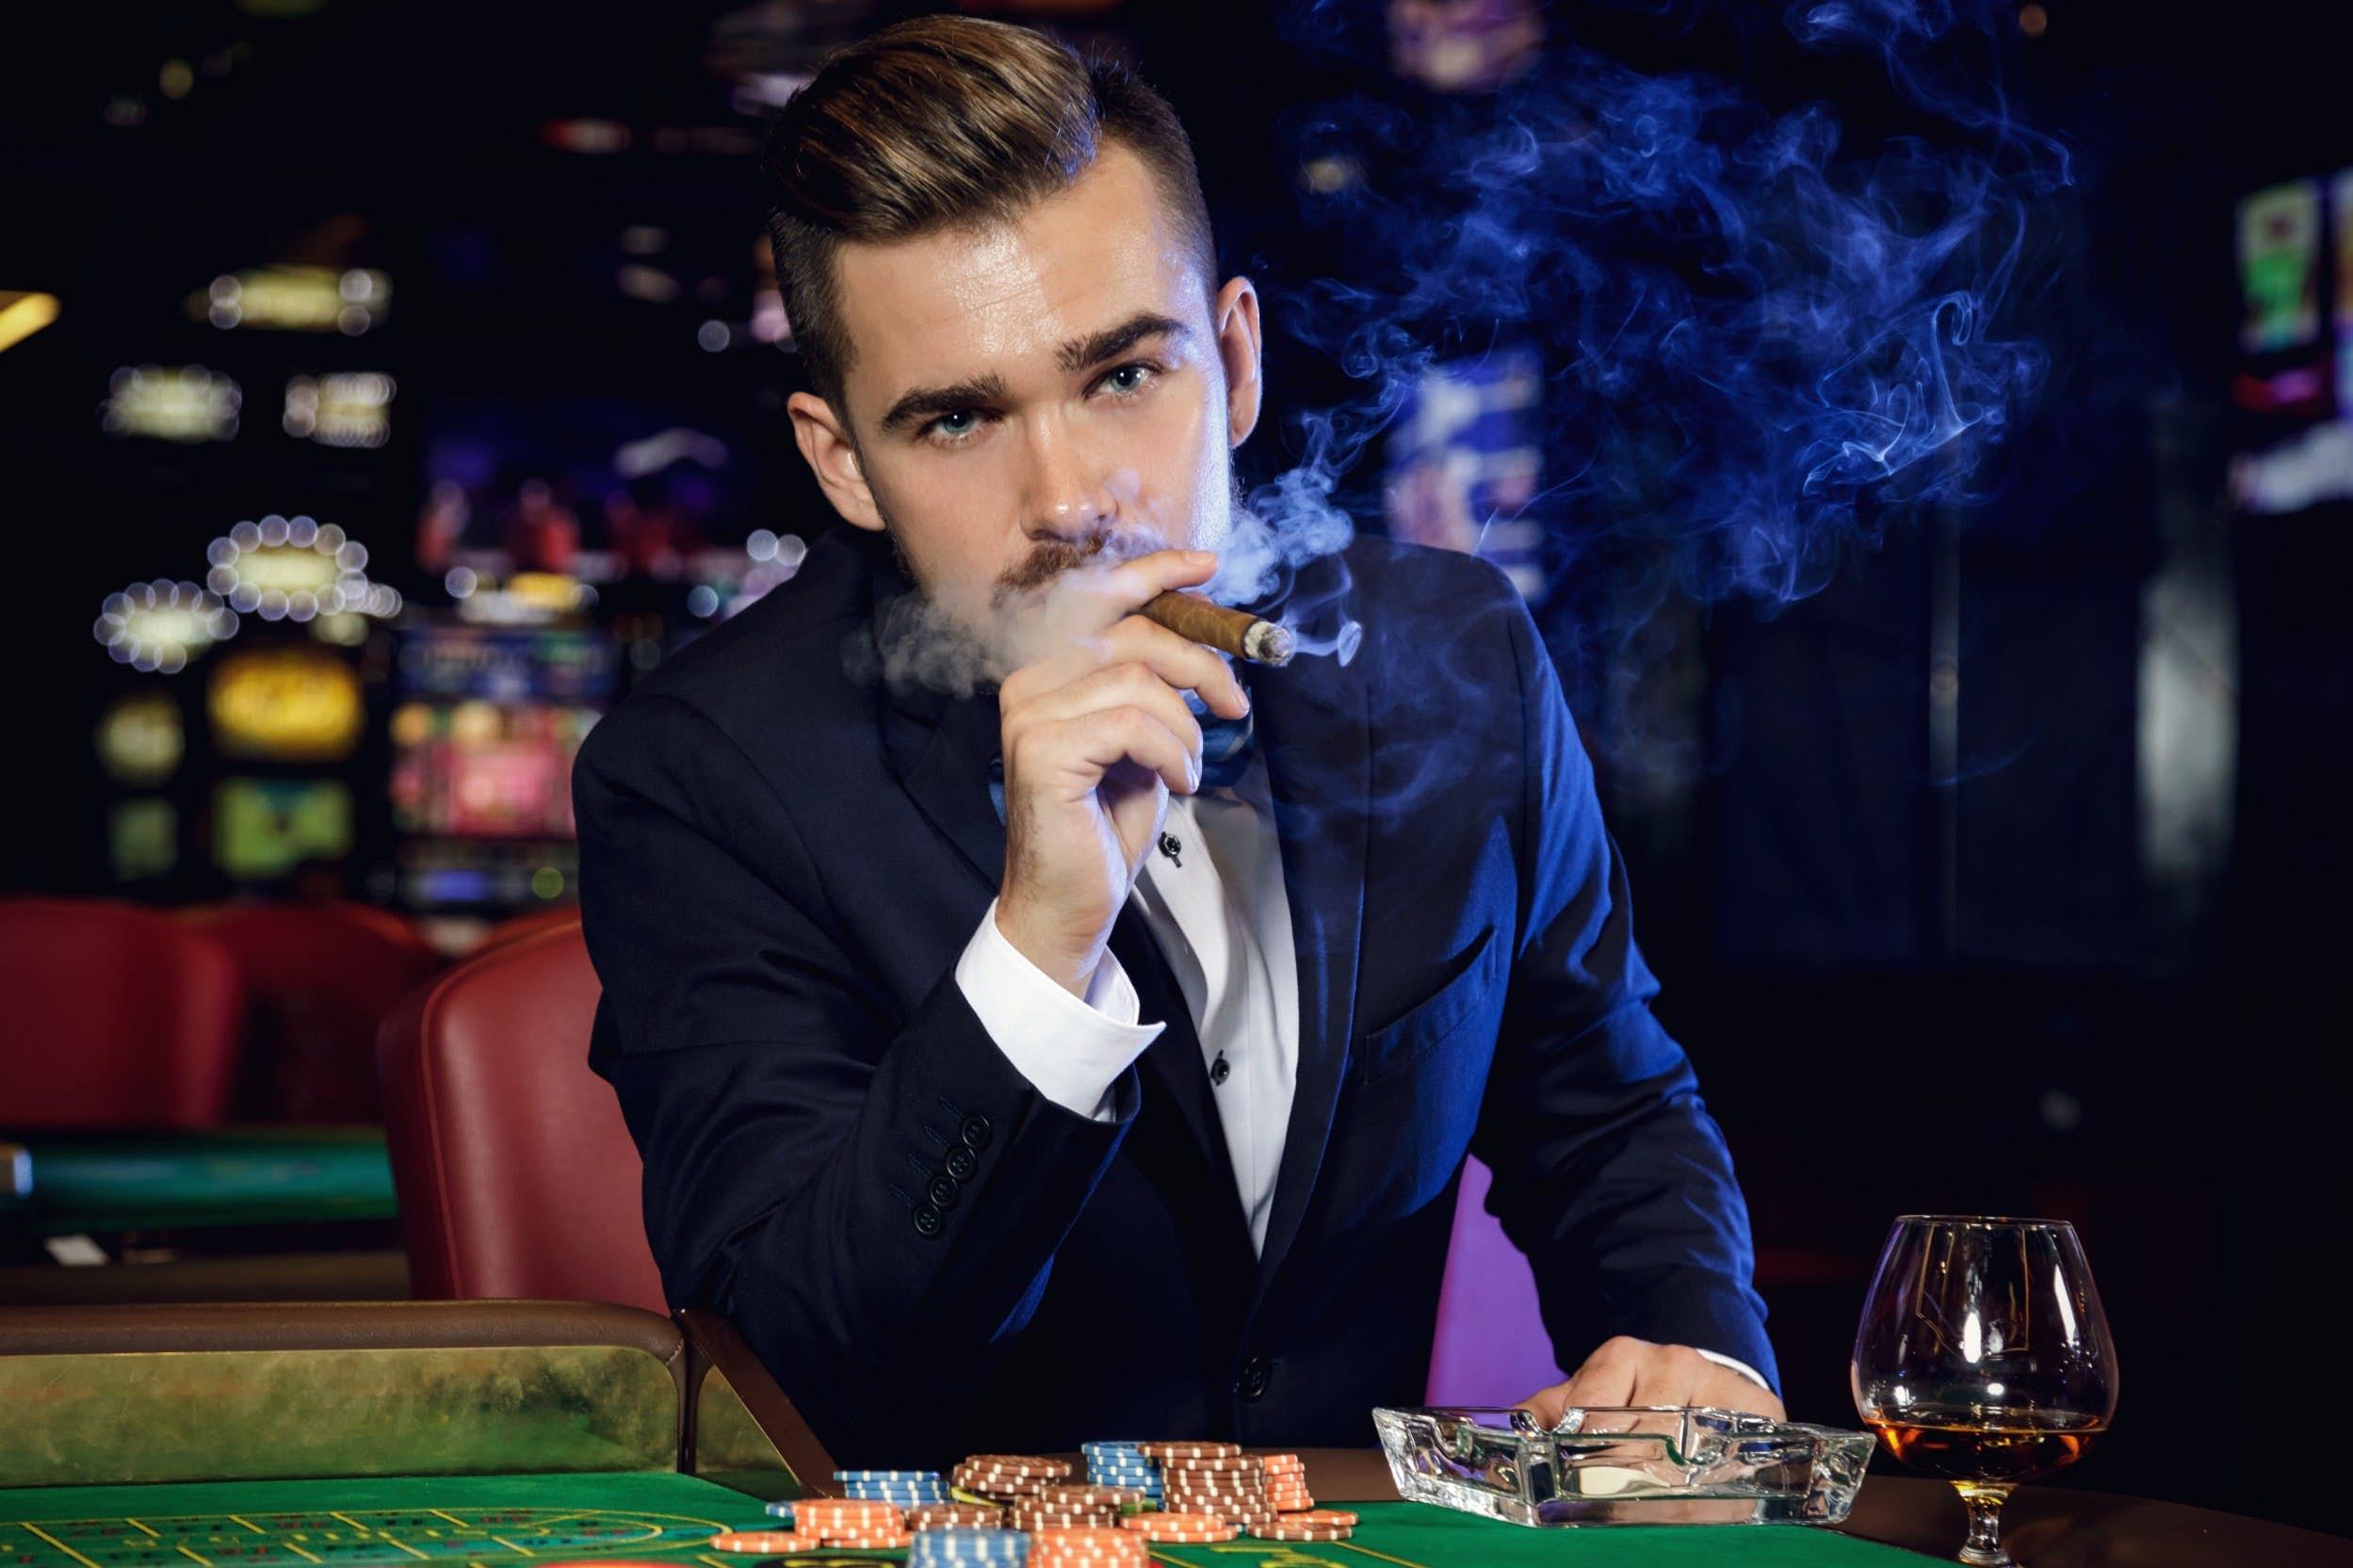 Las Vegas casino sets itself apart - by banning smoking - Lonely Planet